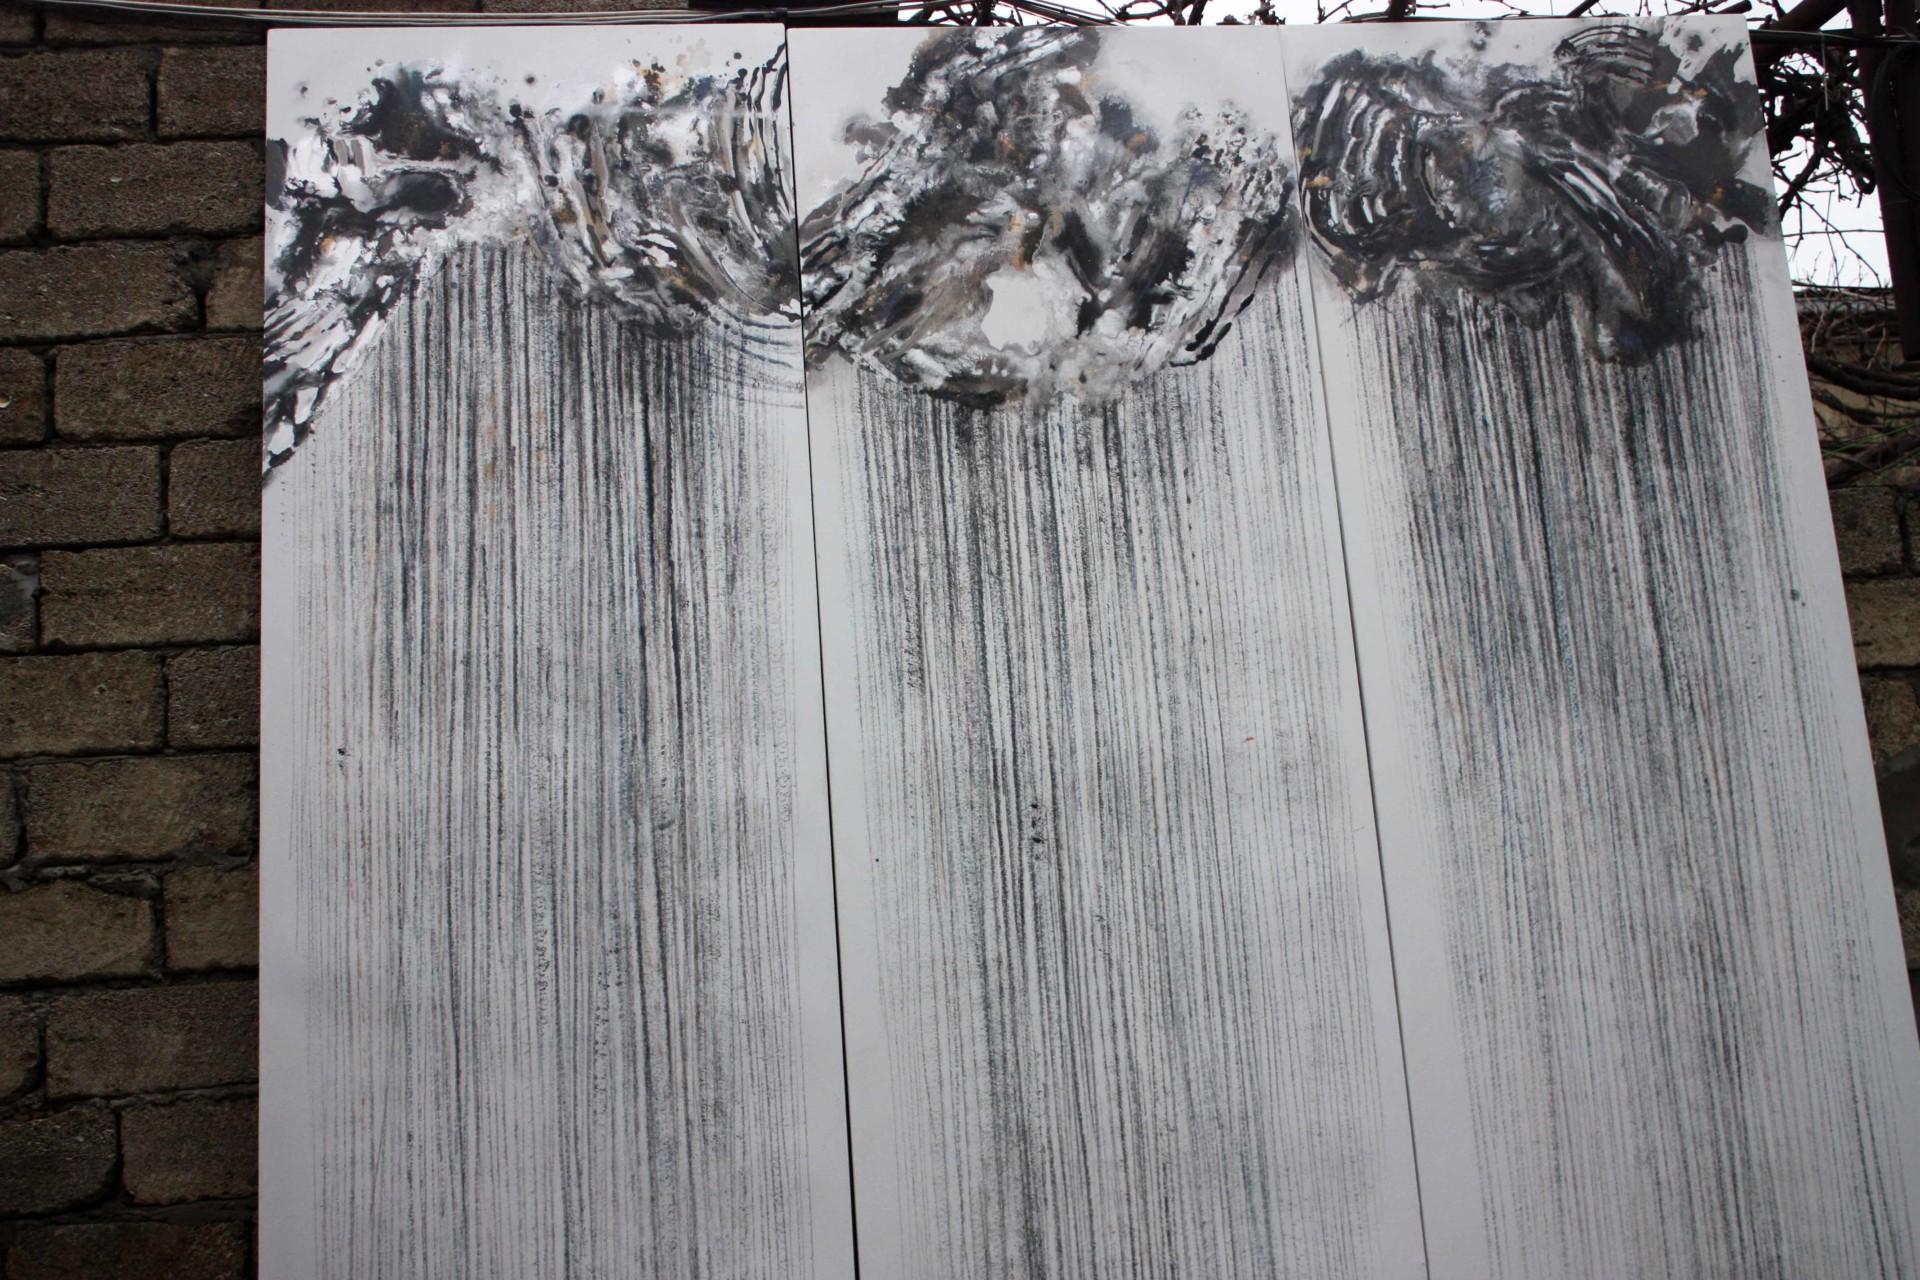 -- RAIN -- oil on canvas 2019